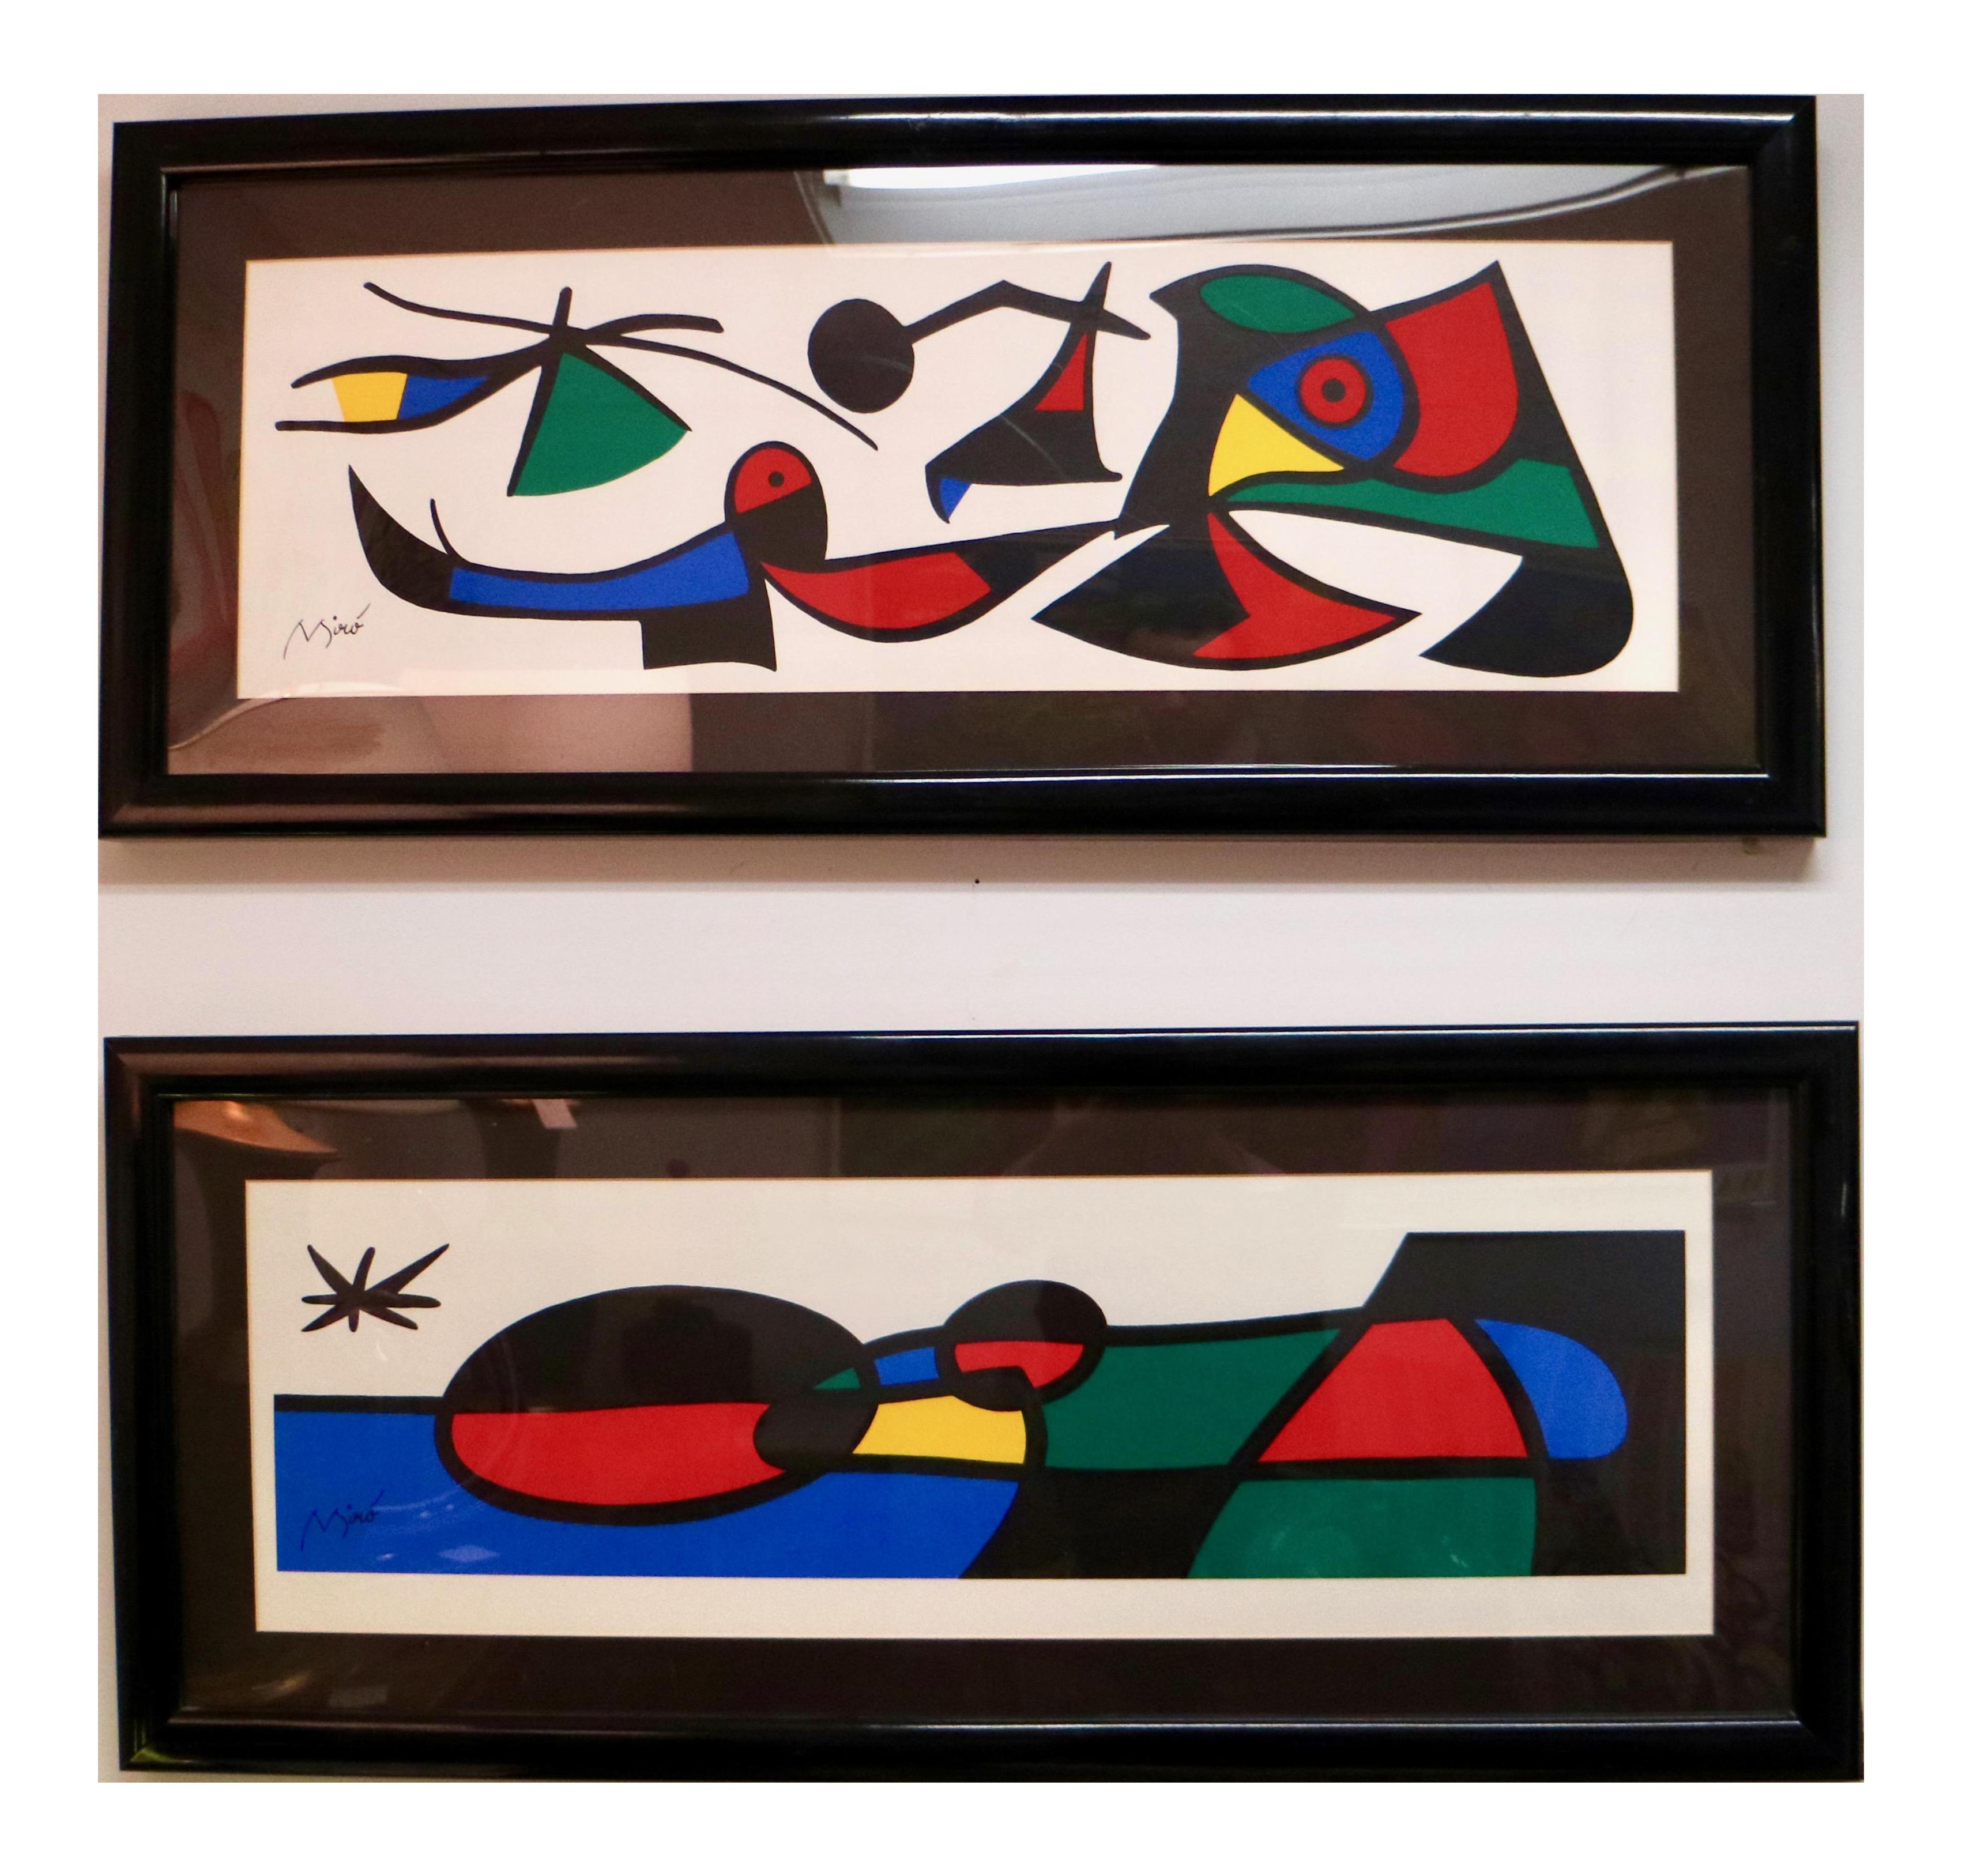 graphic royalty free library Mir silkscreens a pair. Drawing signature joan miro